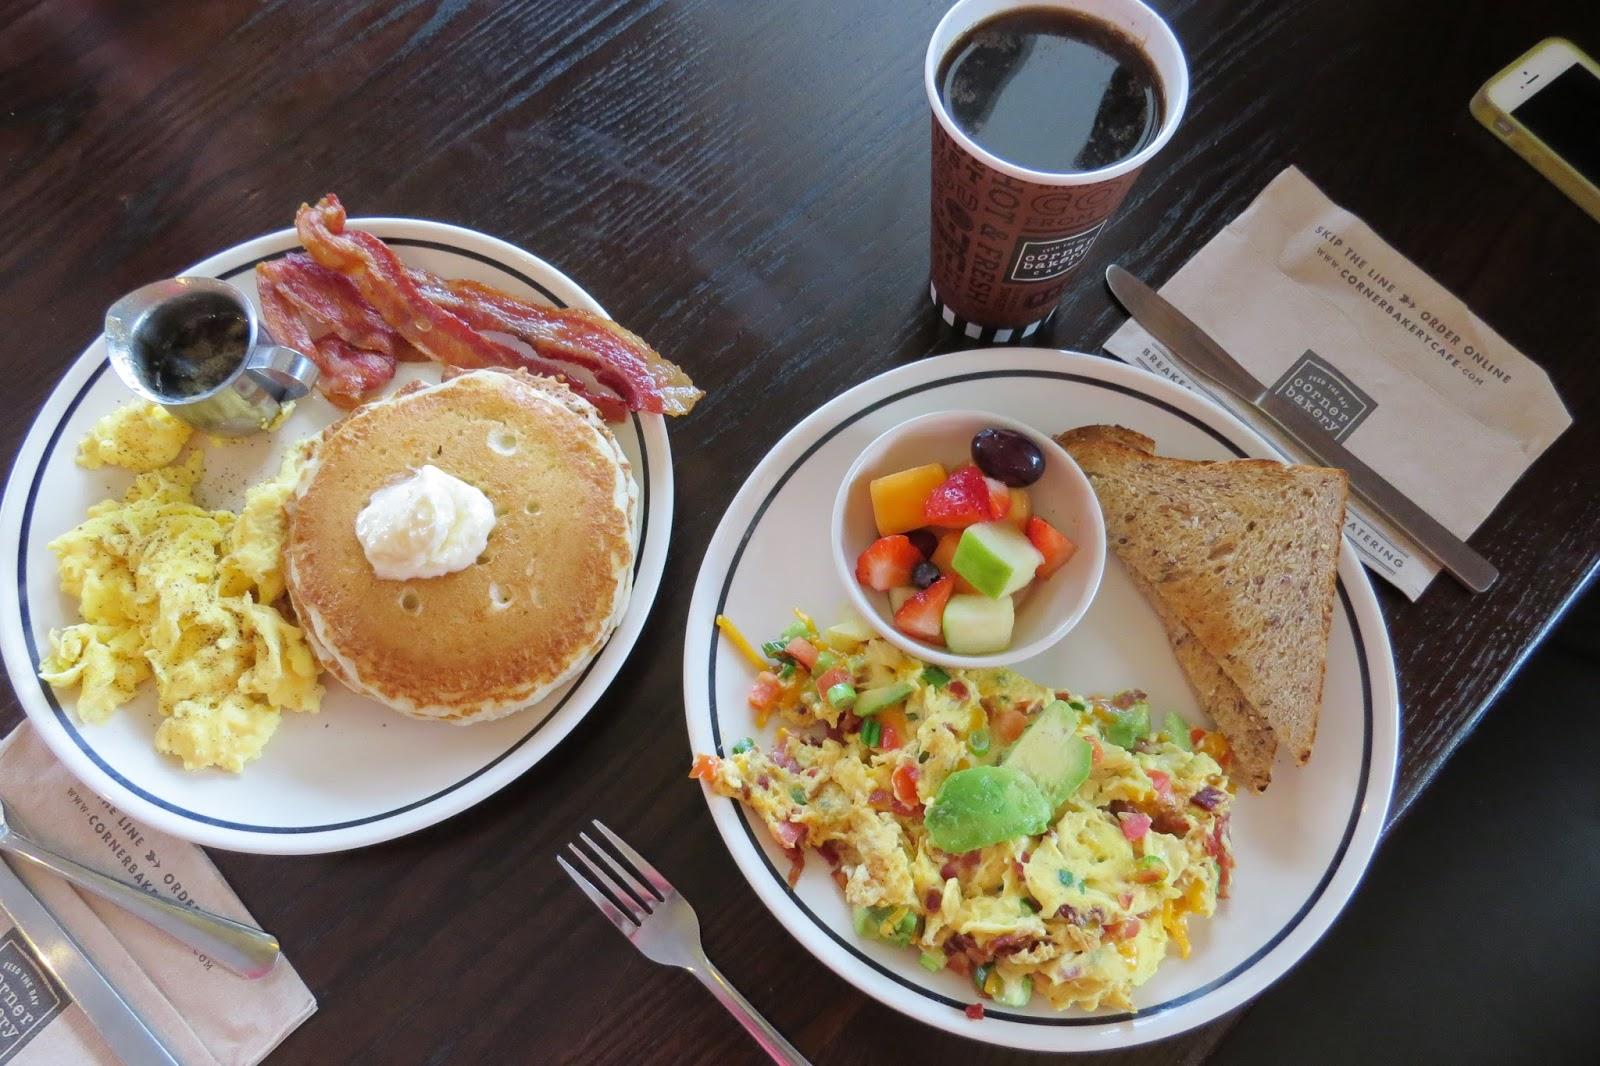 Corner Bakery Cafe Pancakes and Anaheim Scrambler